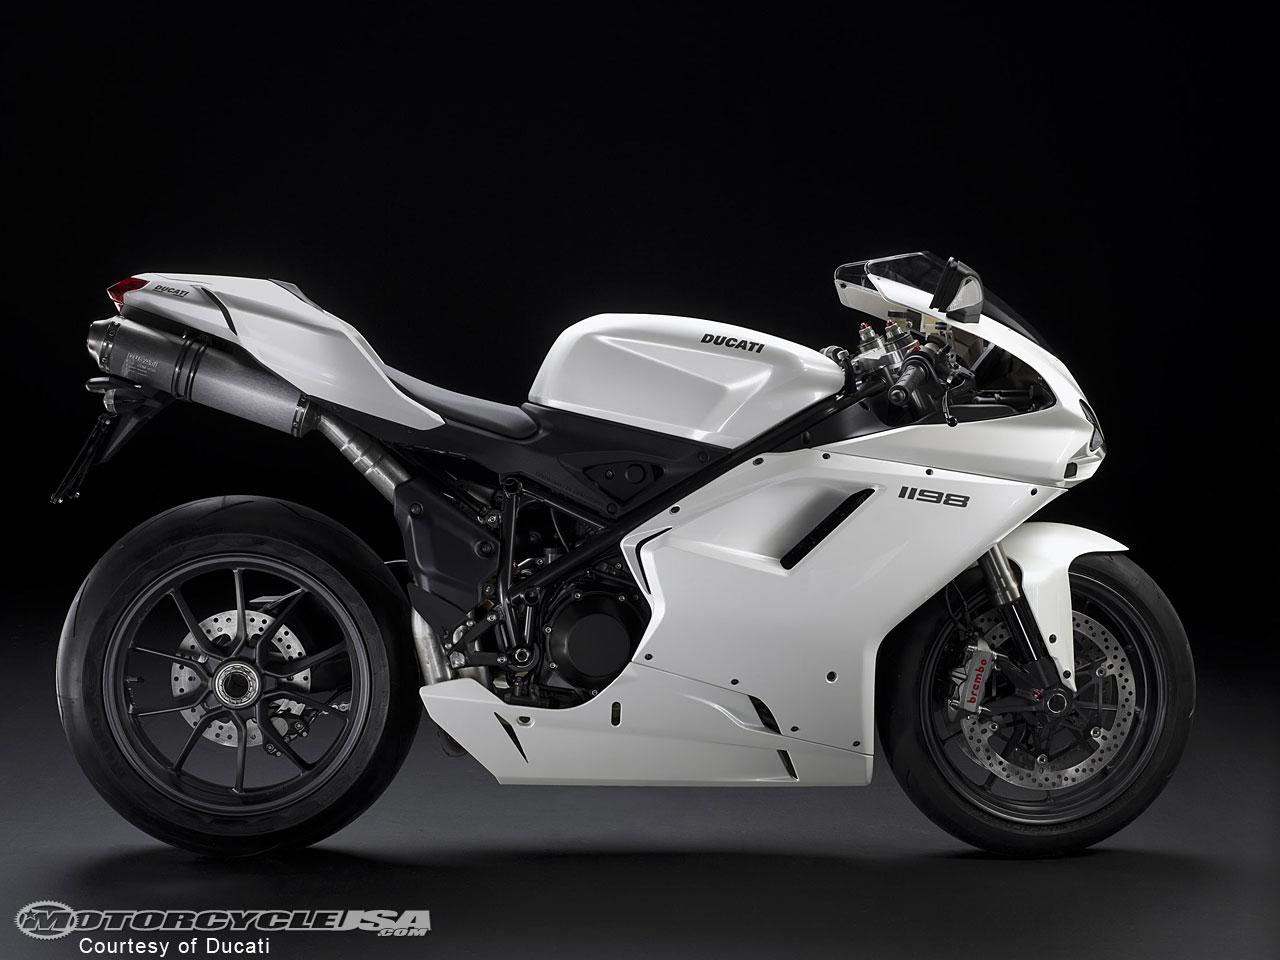 trend motorcycle bike: ducati superbike 1198 sp | ducati superbike